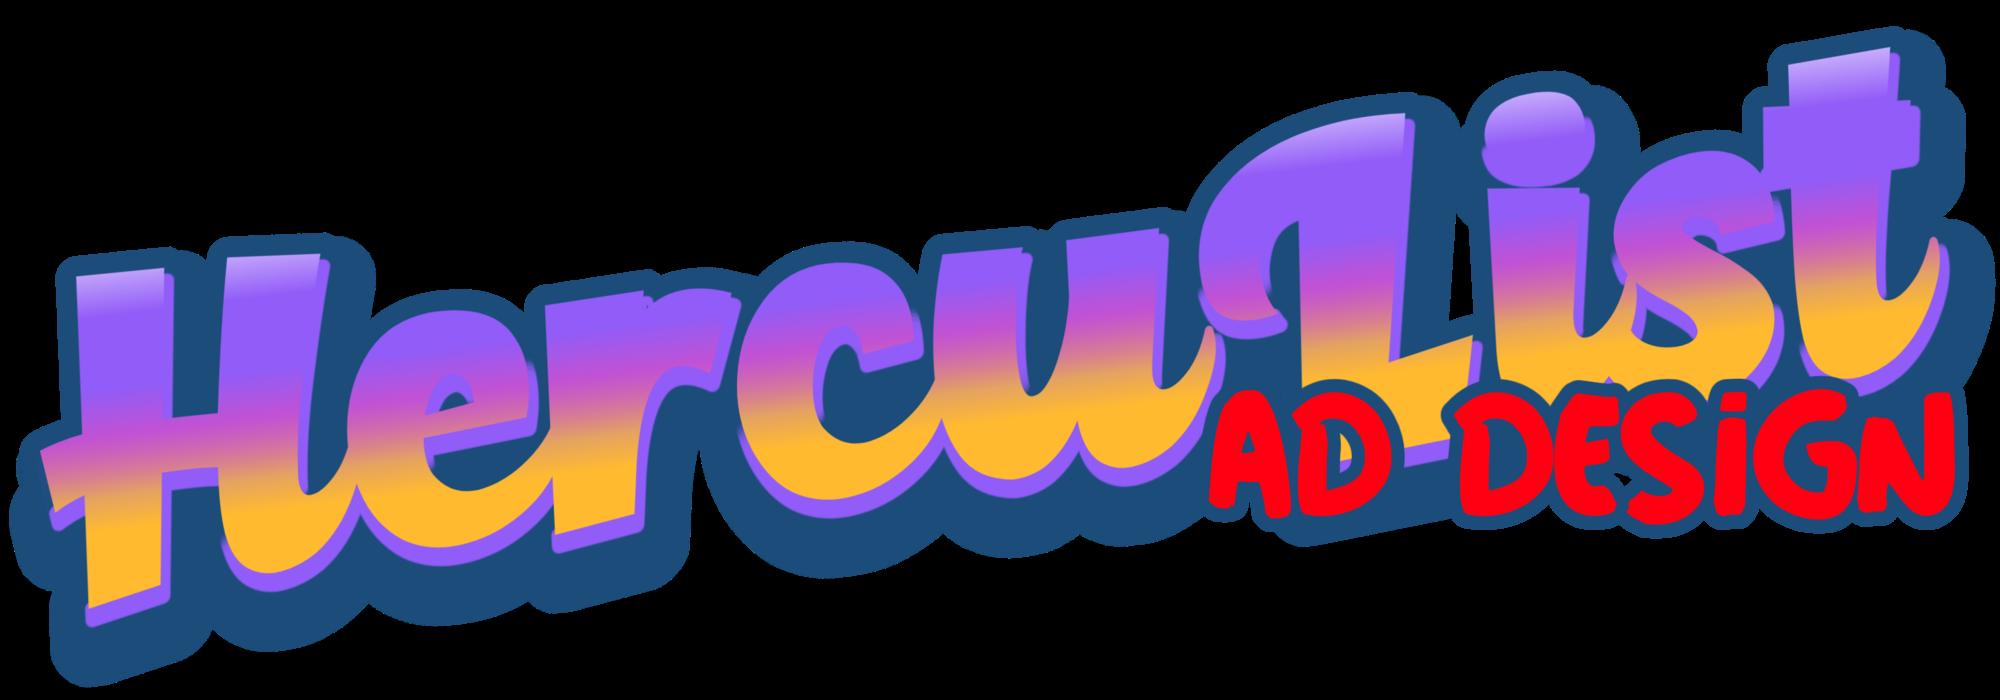 HercuList Design